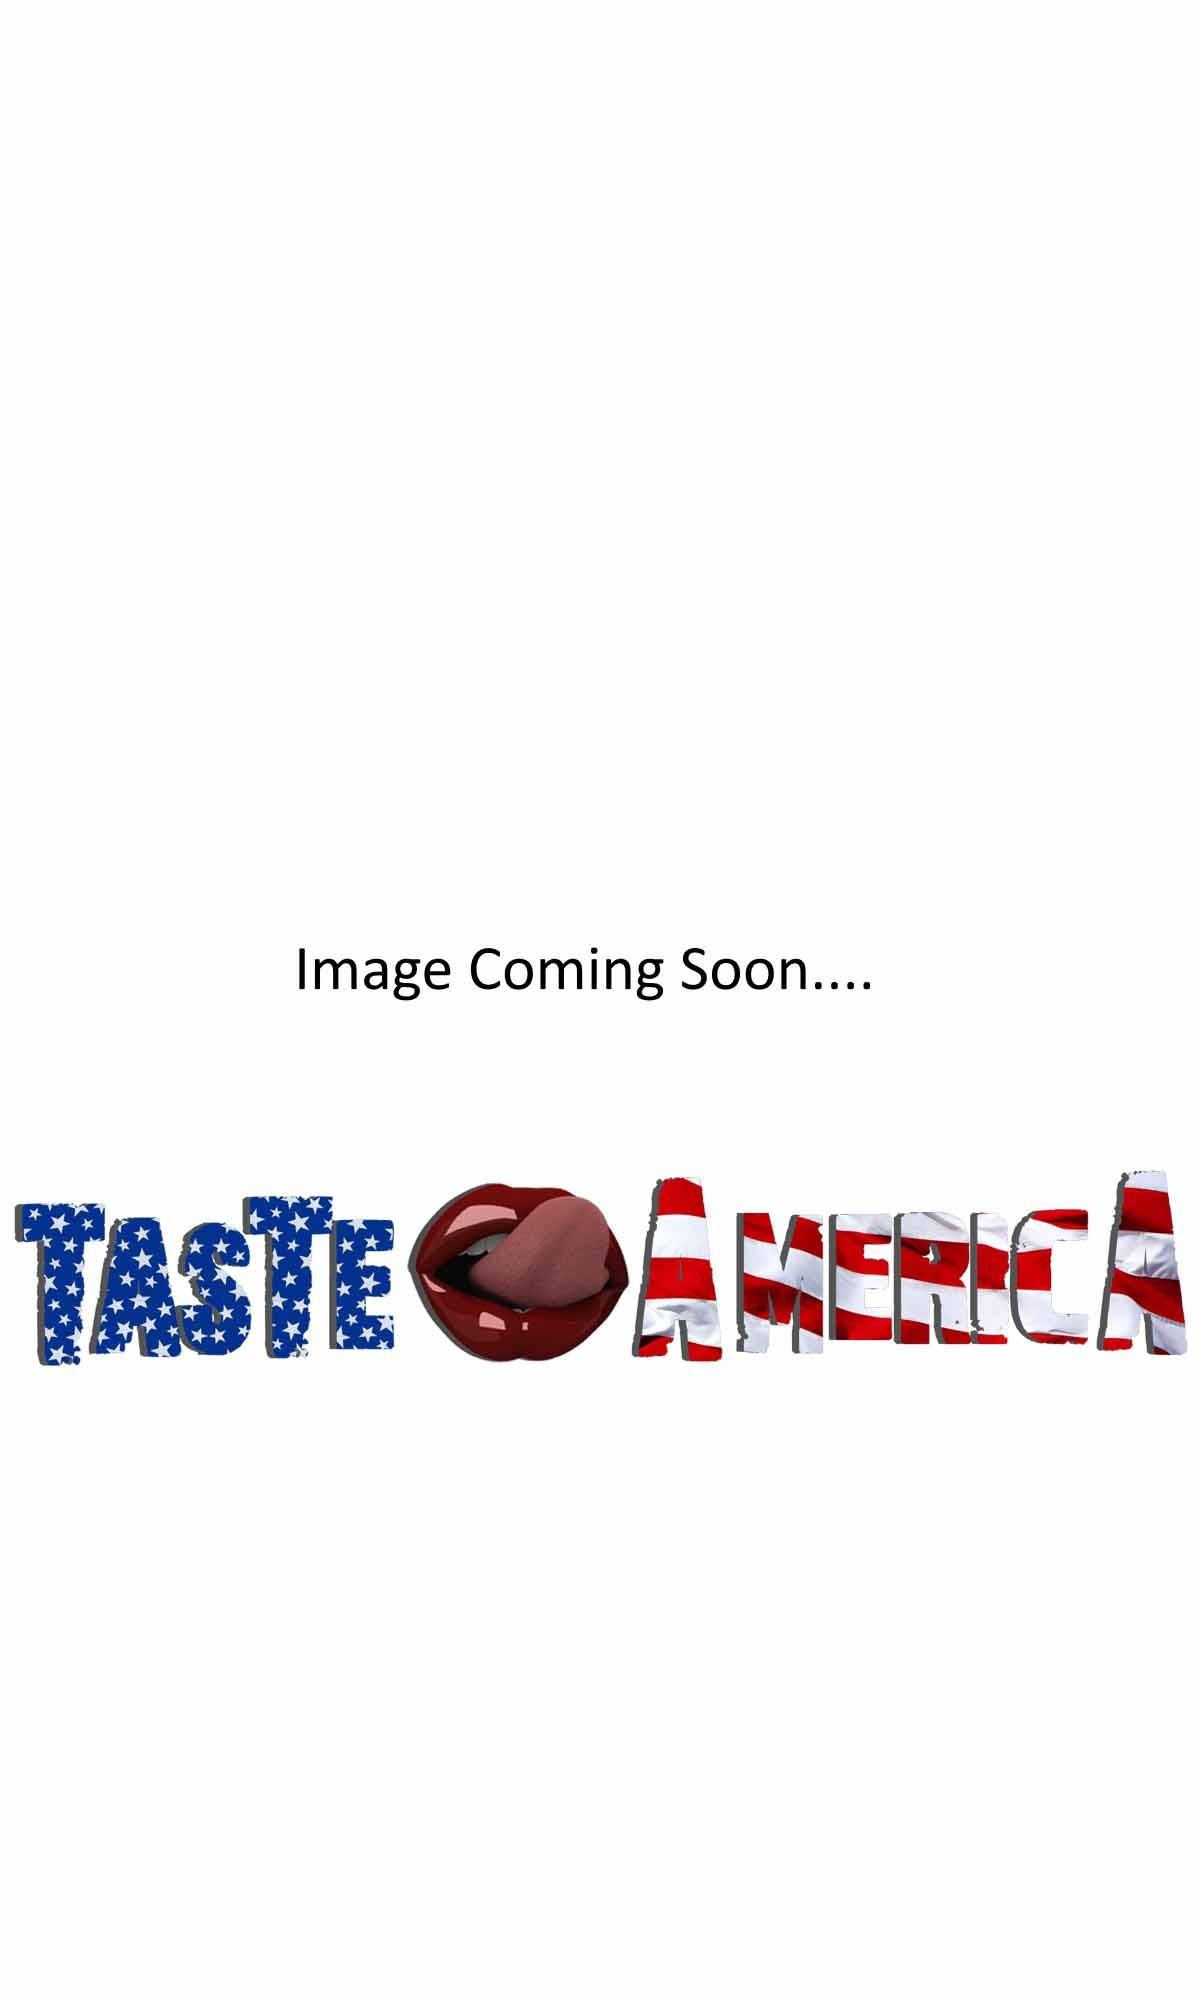 Karo Dark Corn Syrup 473ml Bottle Sold By Taste America